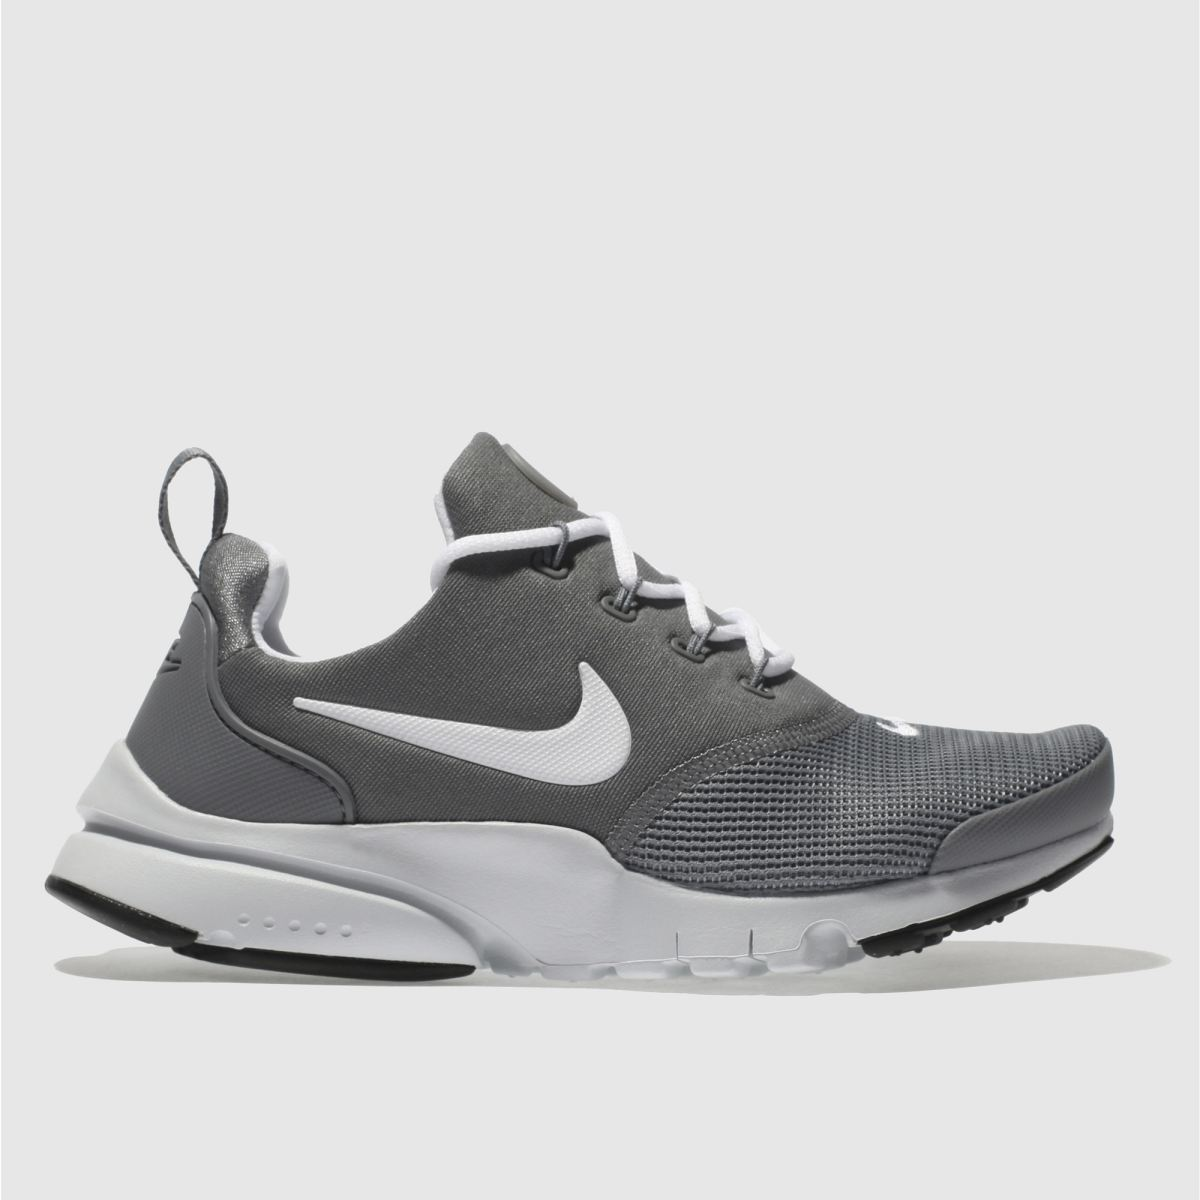 Nike Grey Presto Fly Youth Trainers